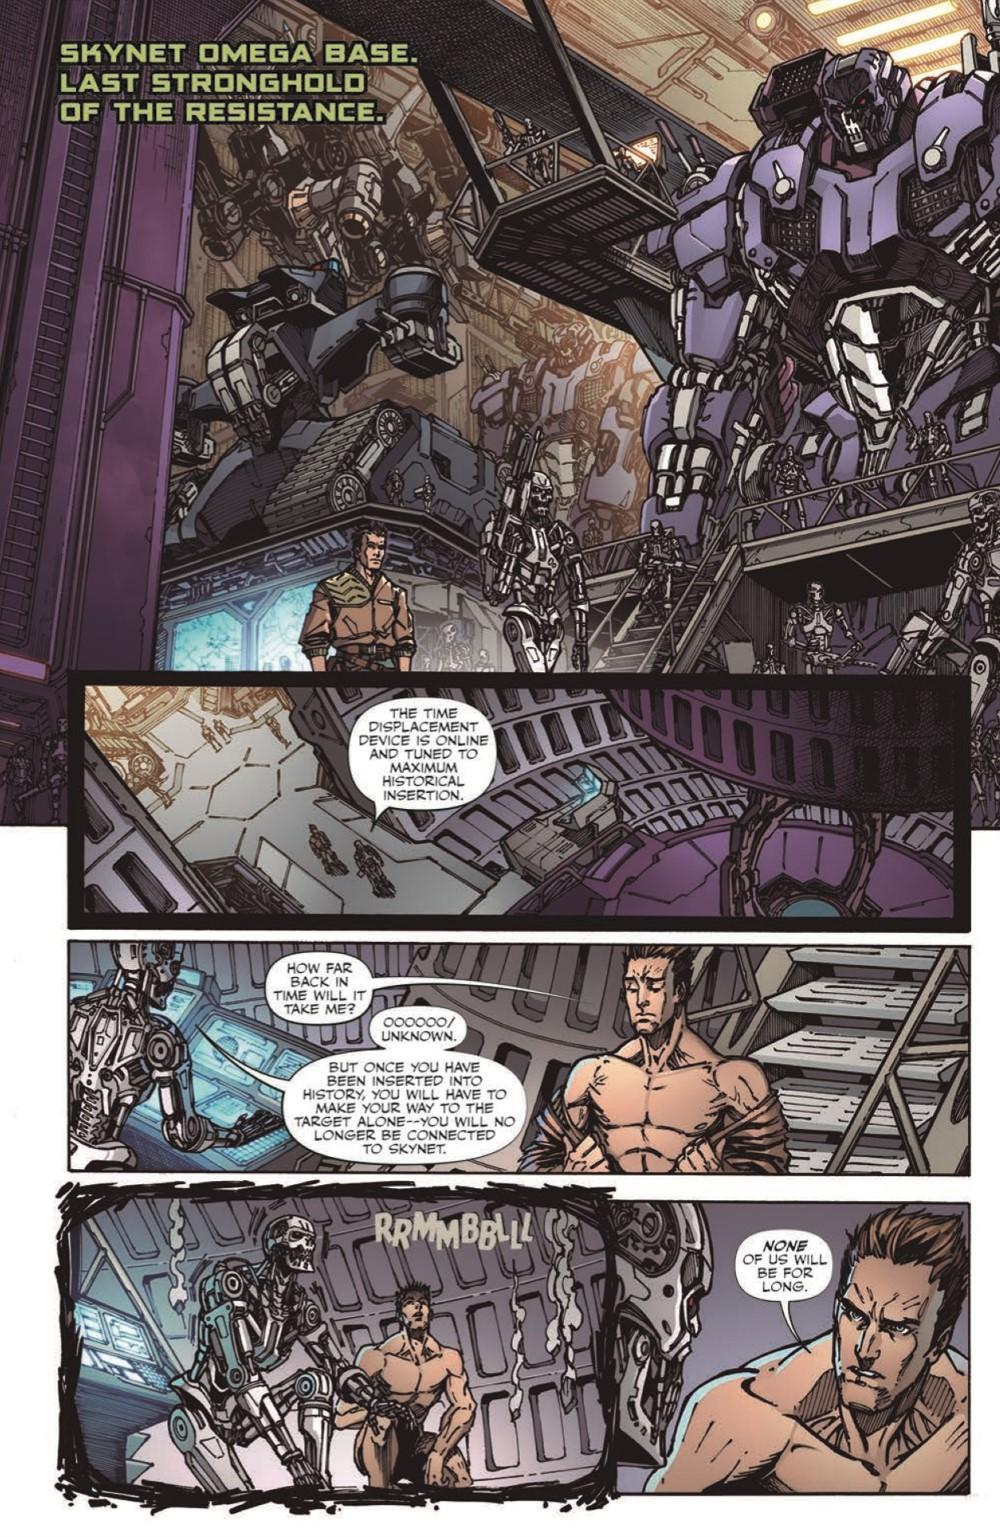 TF-vs-TERMINATOR-pr-8 ComicList Previews: TRANSFORMERS VS THE TERMINATOR ENEMY OF MY ENEMY TP